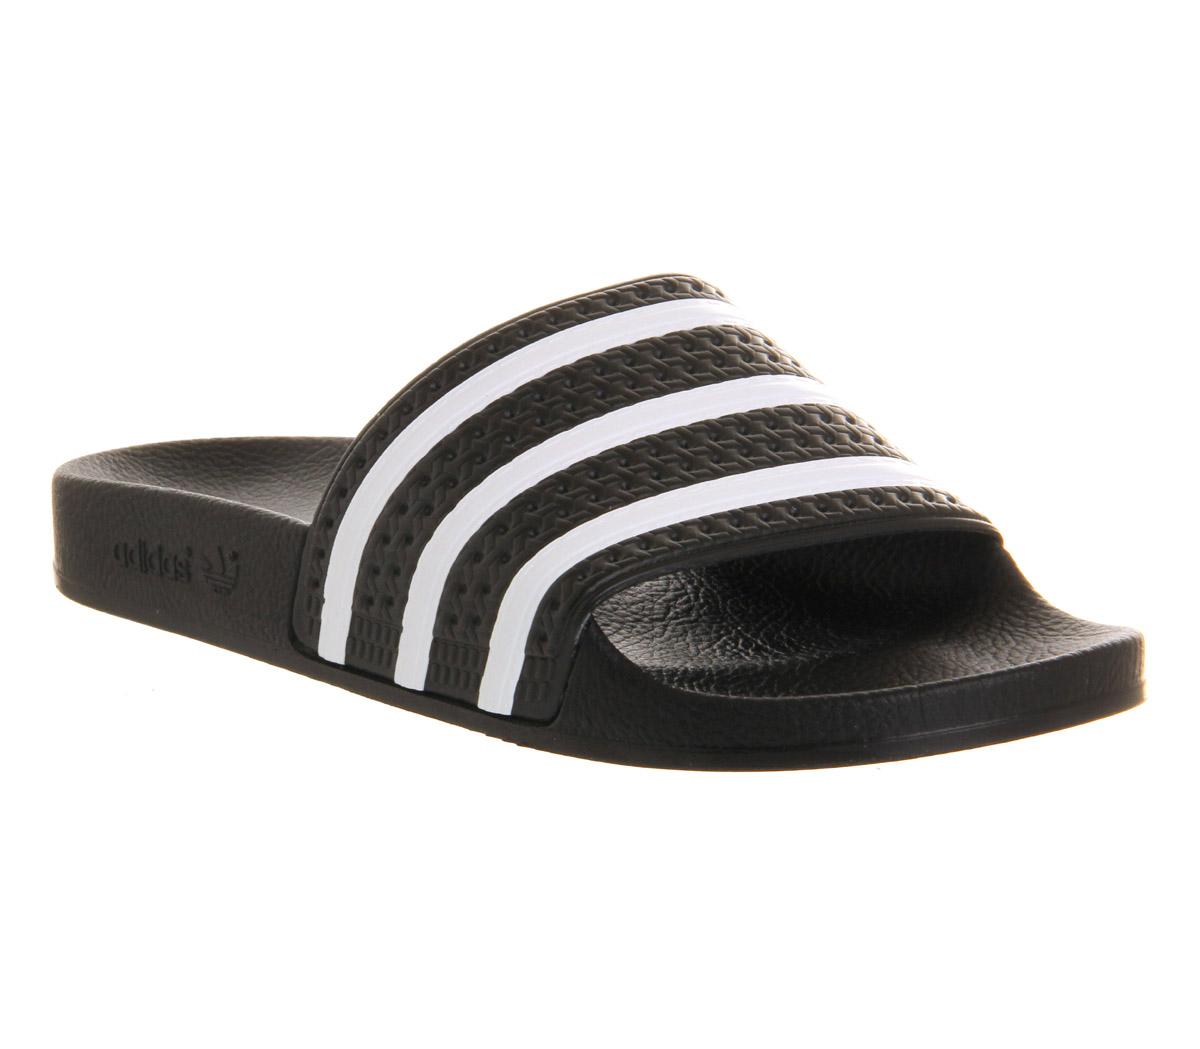 Adidas slides mens AOD1232 [AOD1232] $64.50 : Adidas Shoes